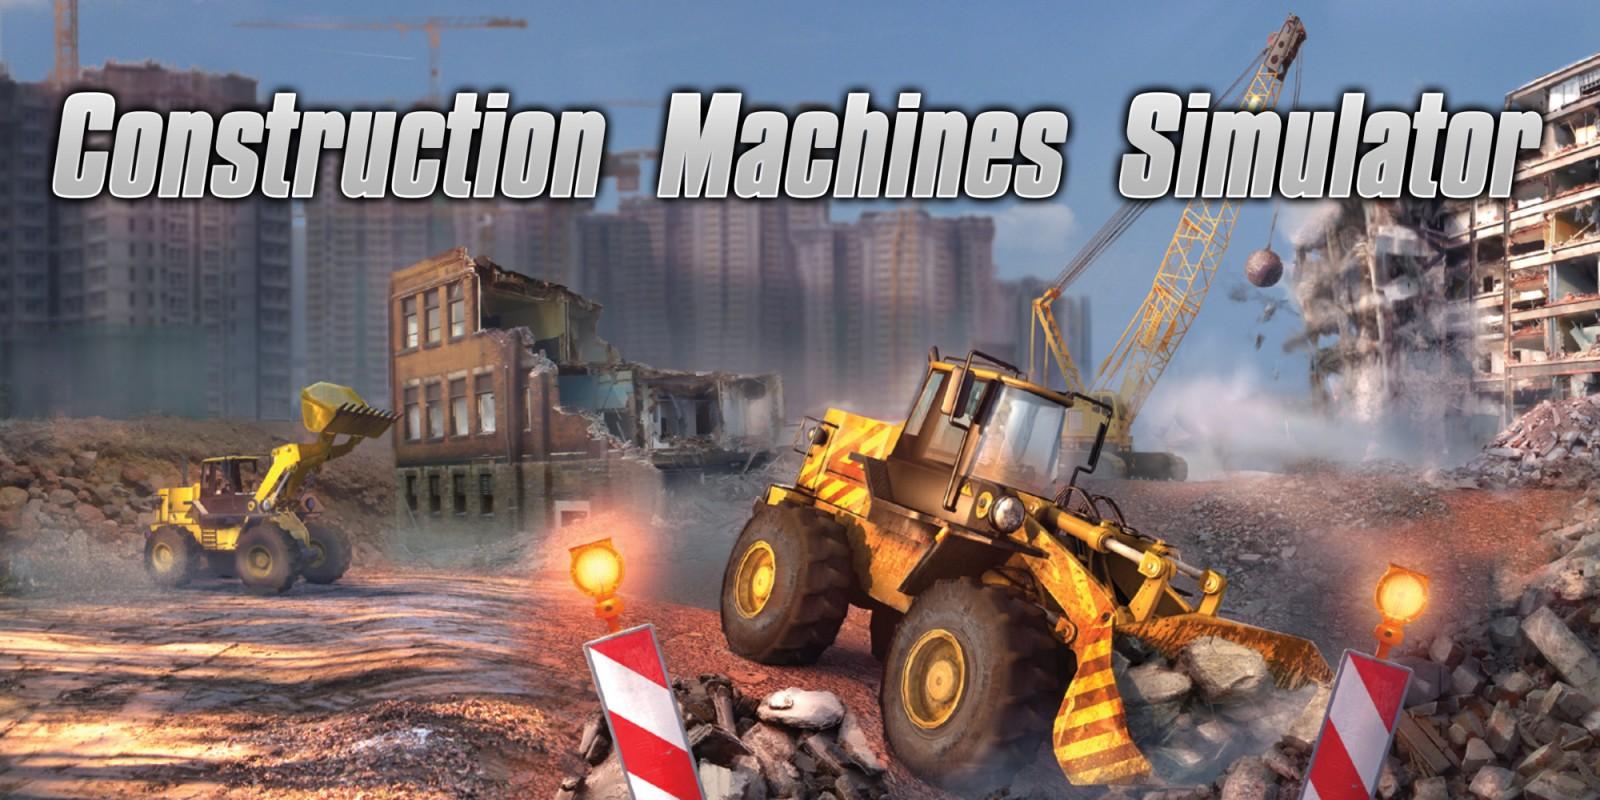 Construction Machines Simulator Nintendo Switch Review